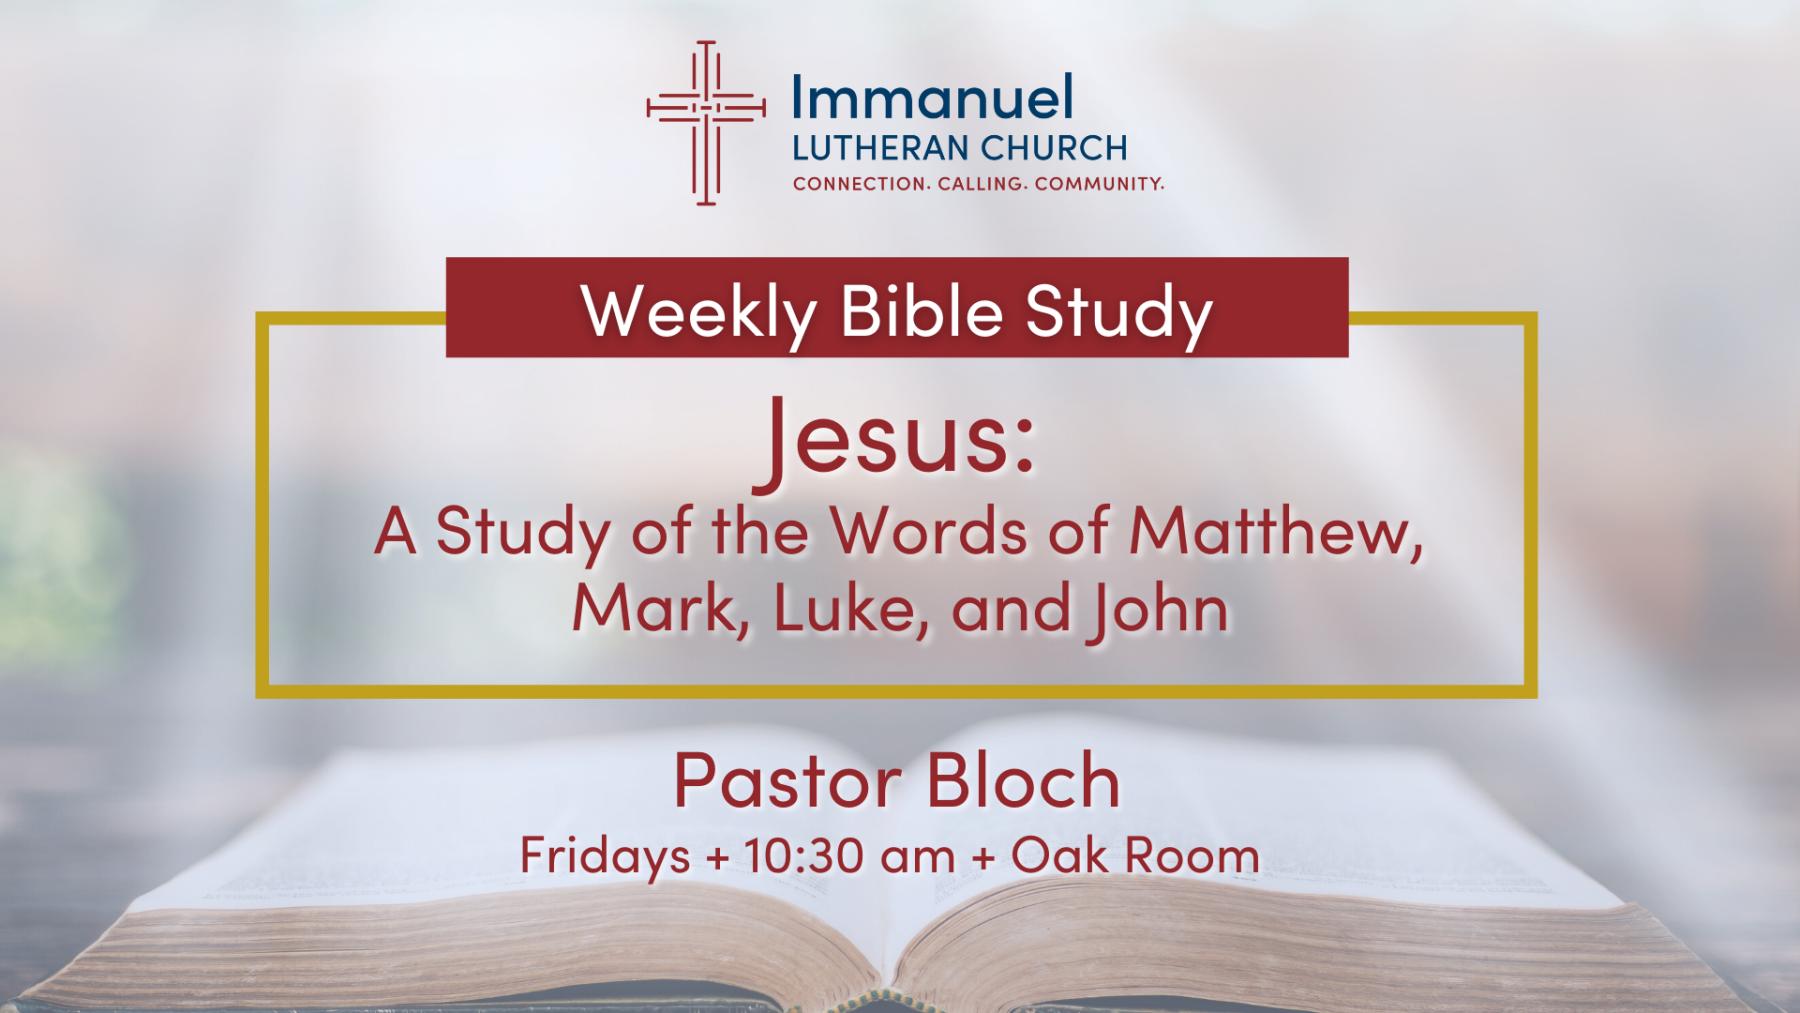 Jesus: A Study of the Words of Matthew, Mark, Luke, and John